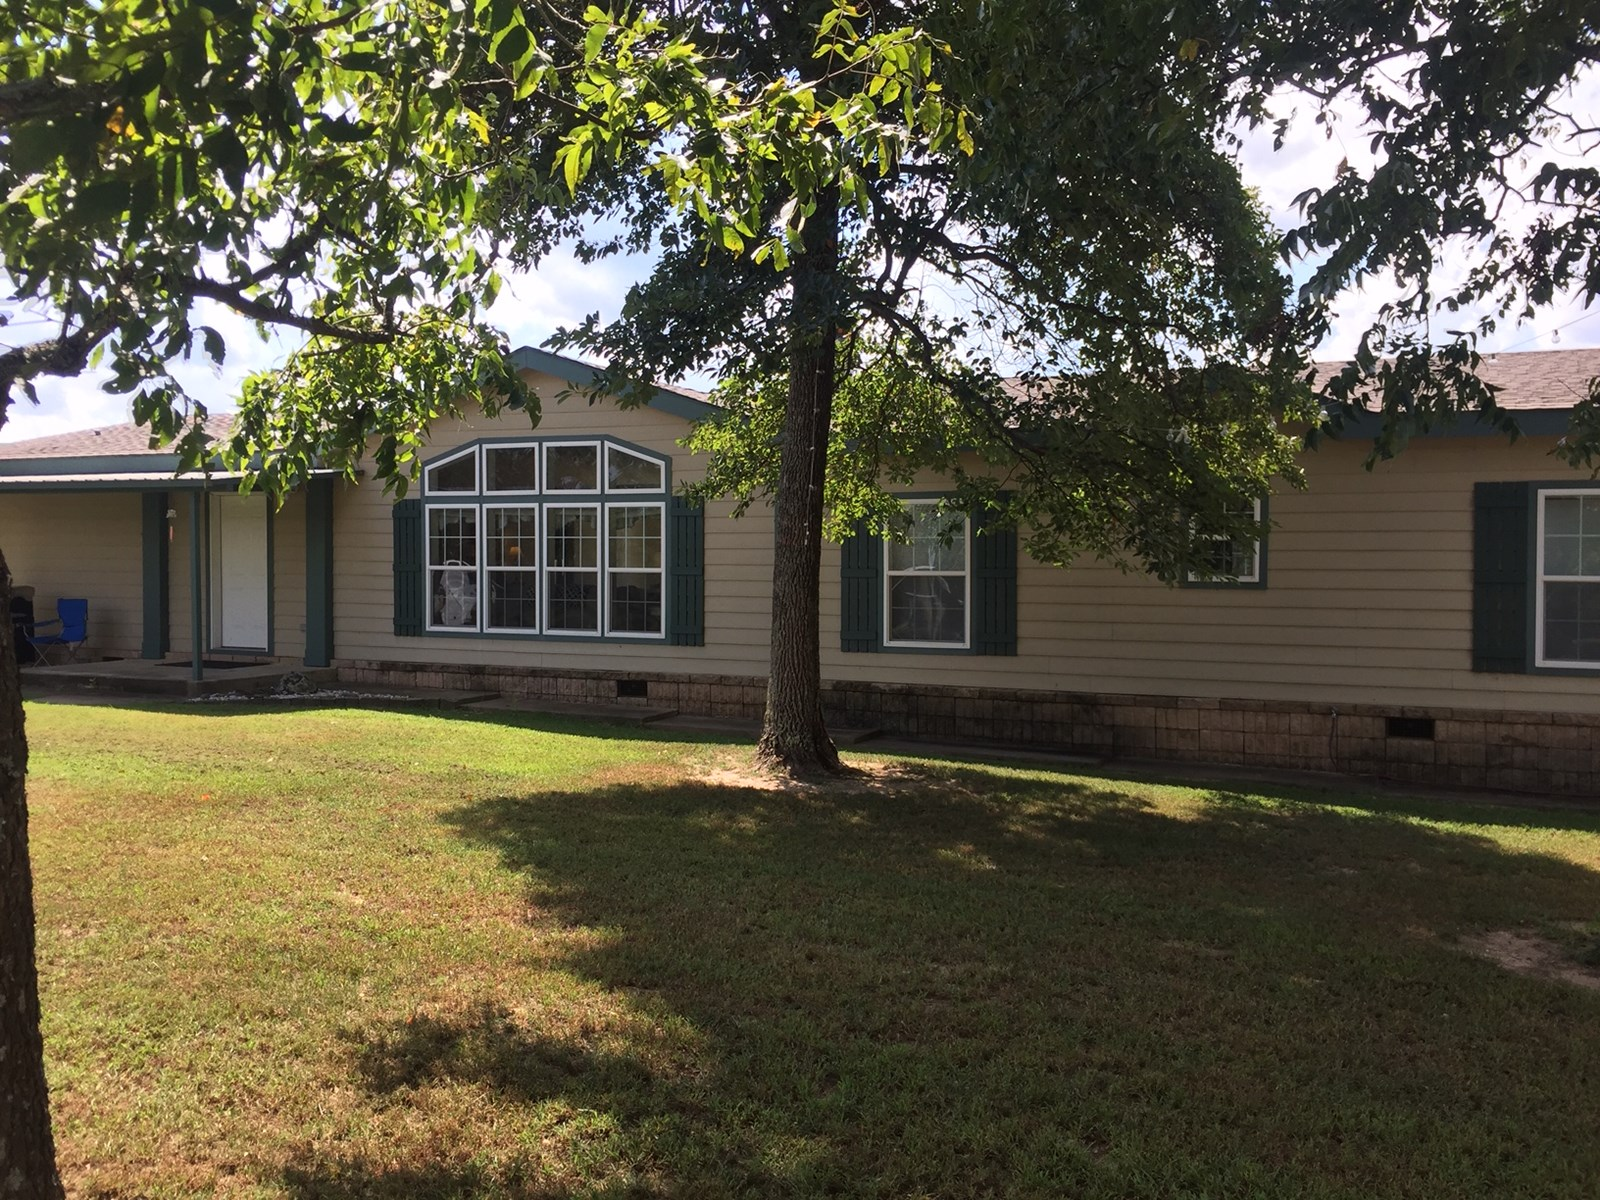 Country Home for Sale Nashoba,OK- Mountain Ranch w/ River OK